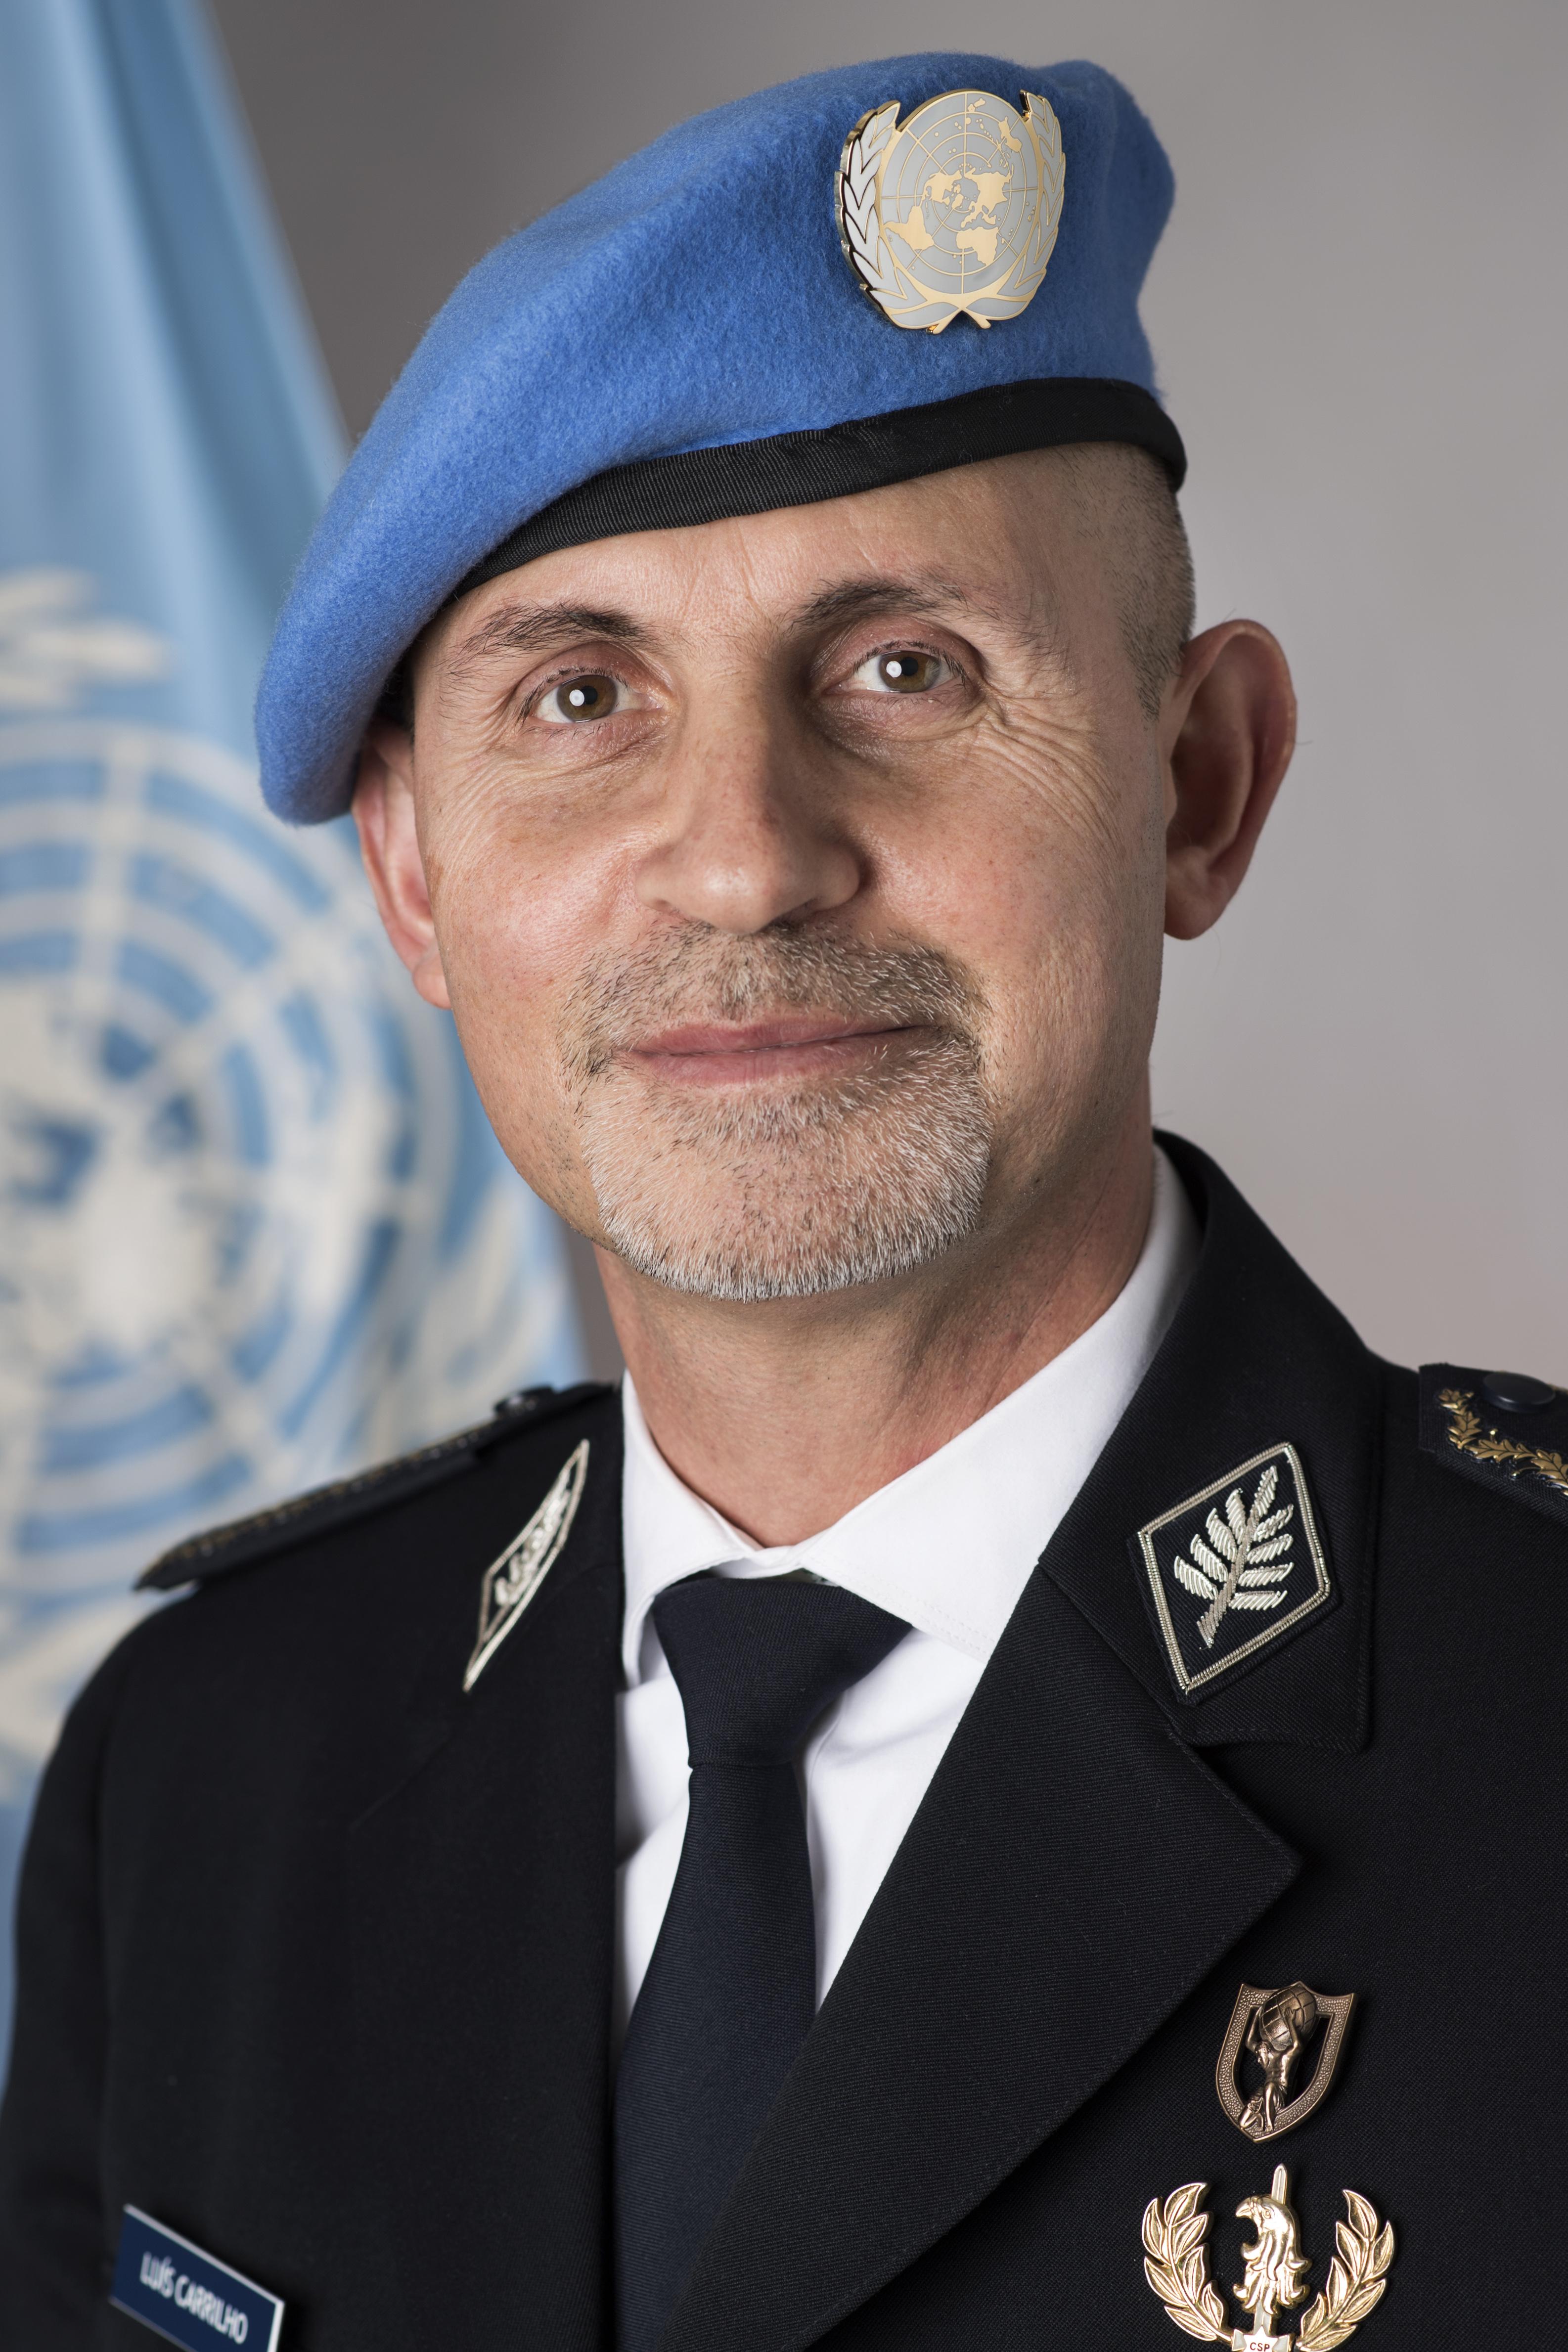 UN Police Adviser Luis Carrilho